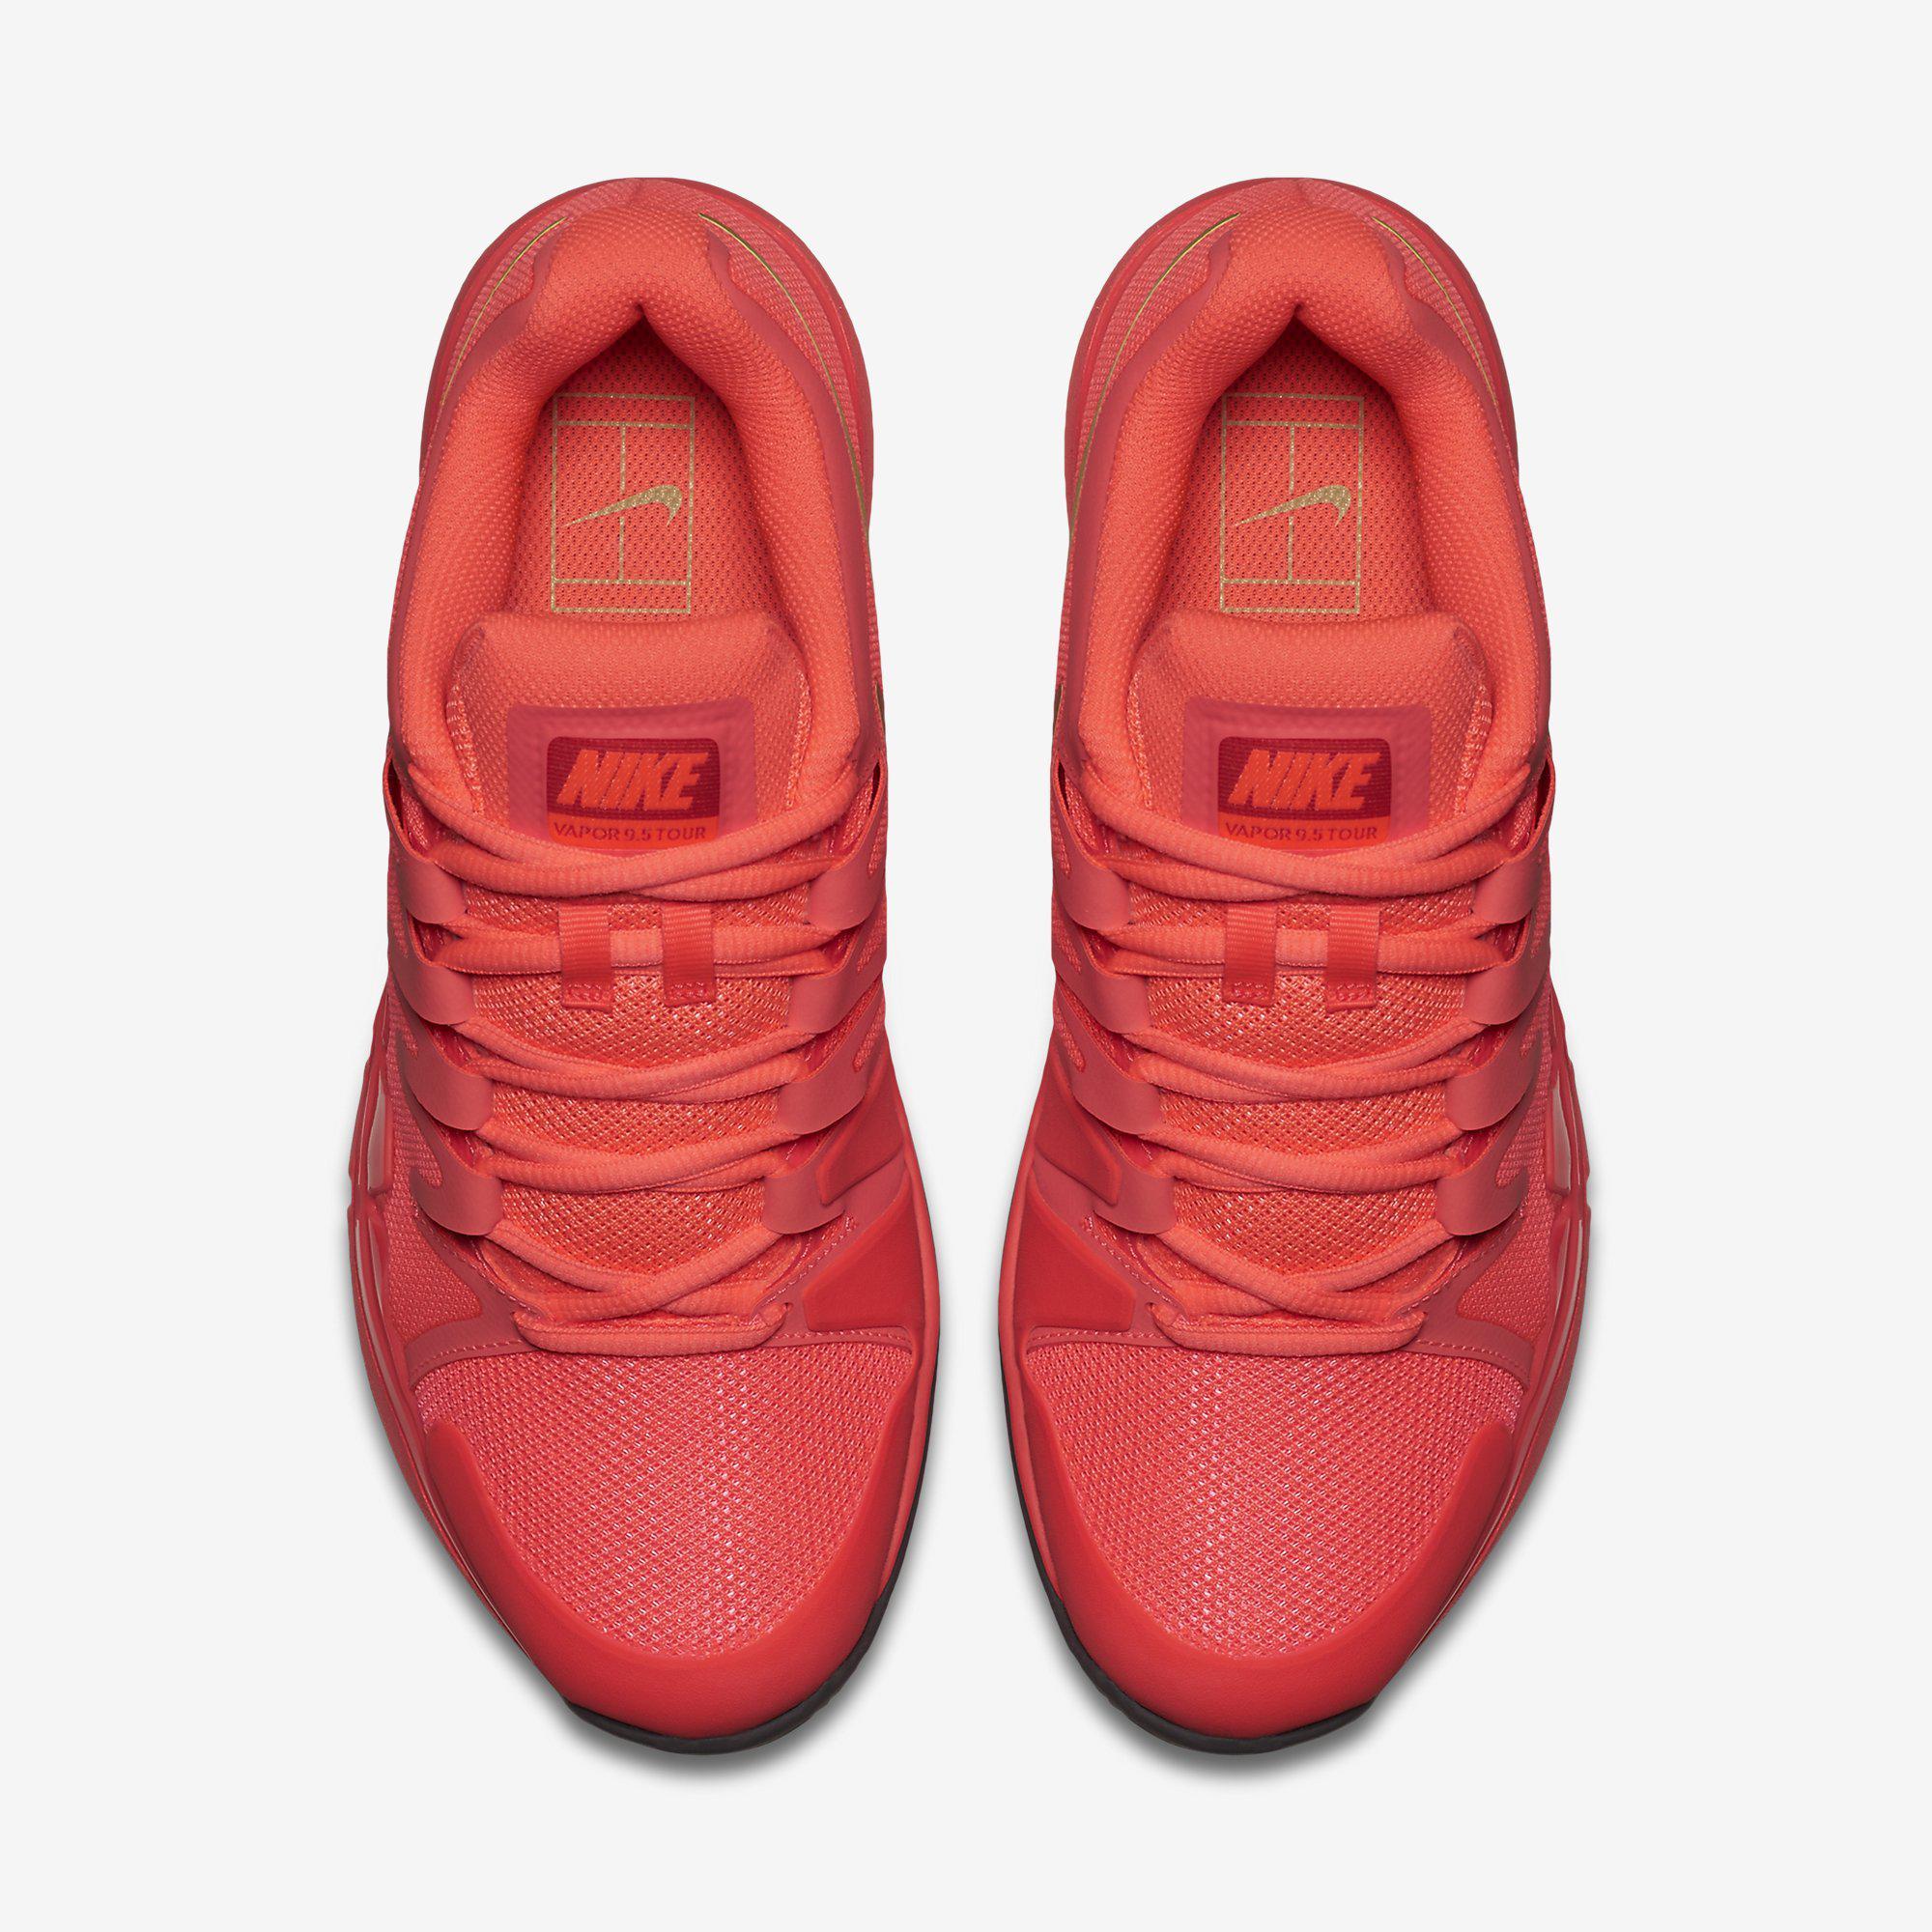 4e06636446dc1 Nike Womens Zoom Vapor 9.5 Tennis Shoes - Hot Lava Metallic Gold Star